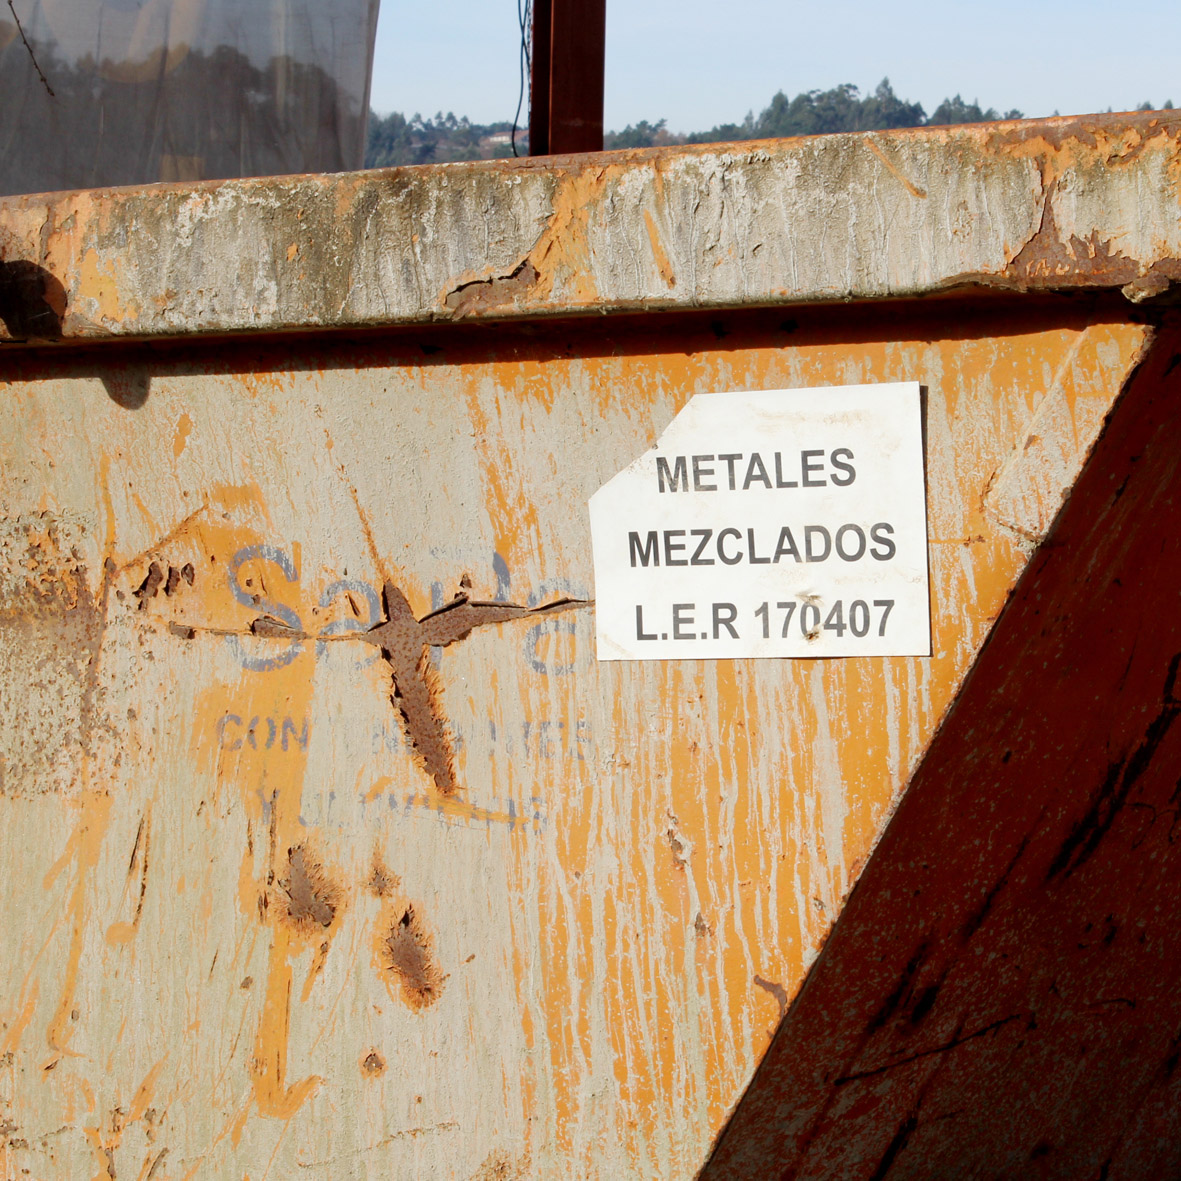 METALES MEZCLADOS